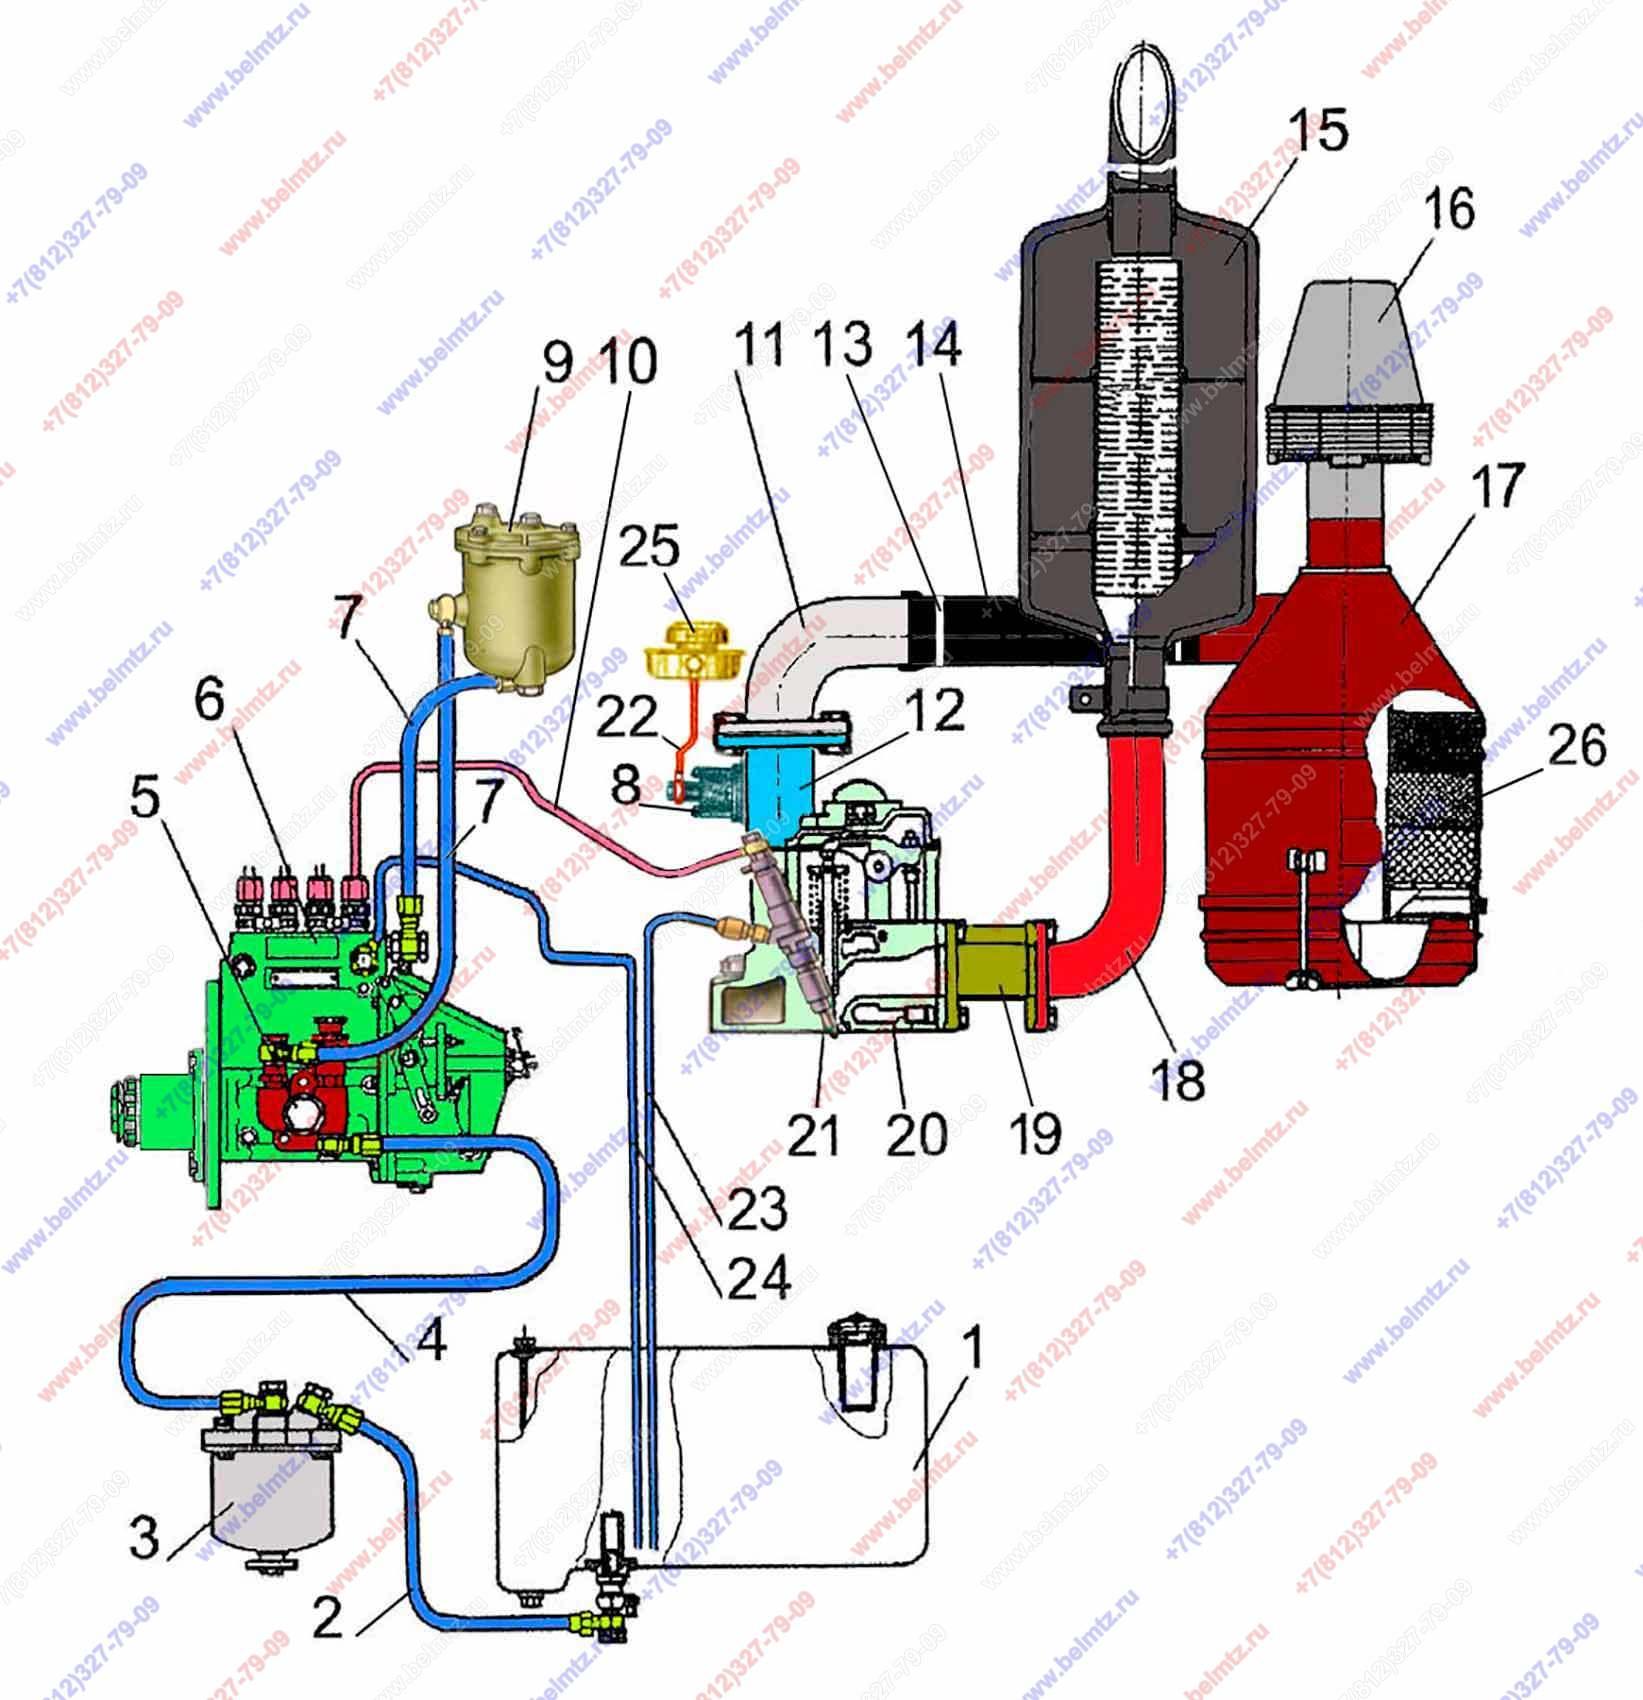 Трубки топливные ТНВД Камаз N 1-8 (к-т) (1104.310-324.